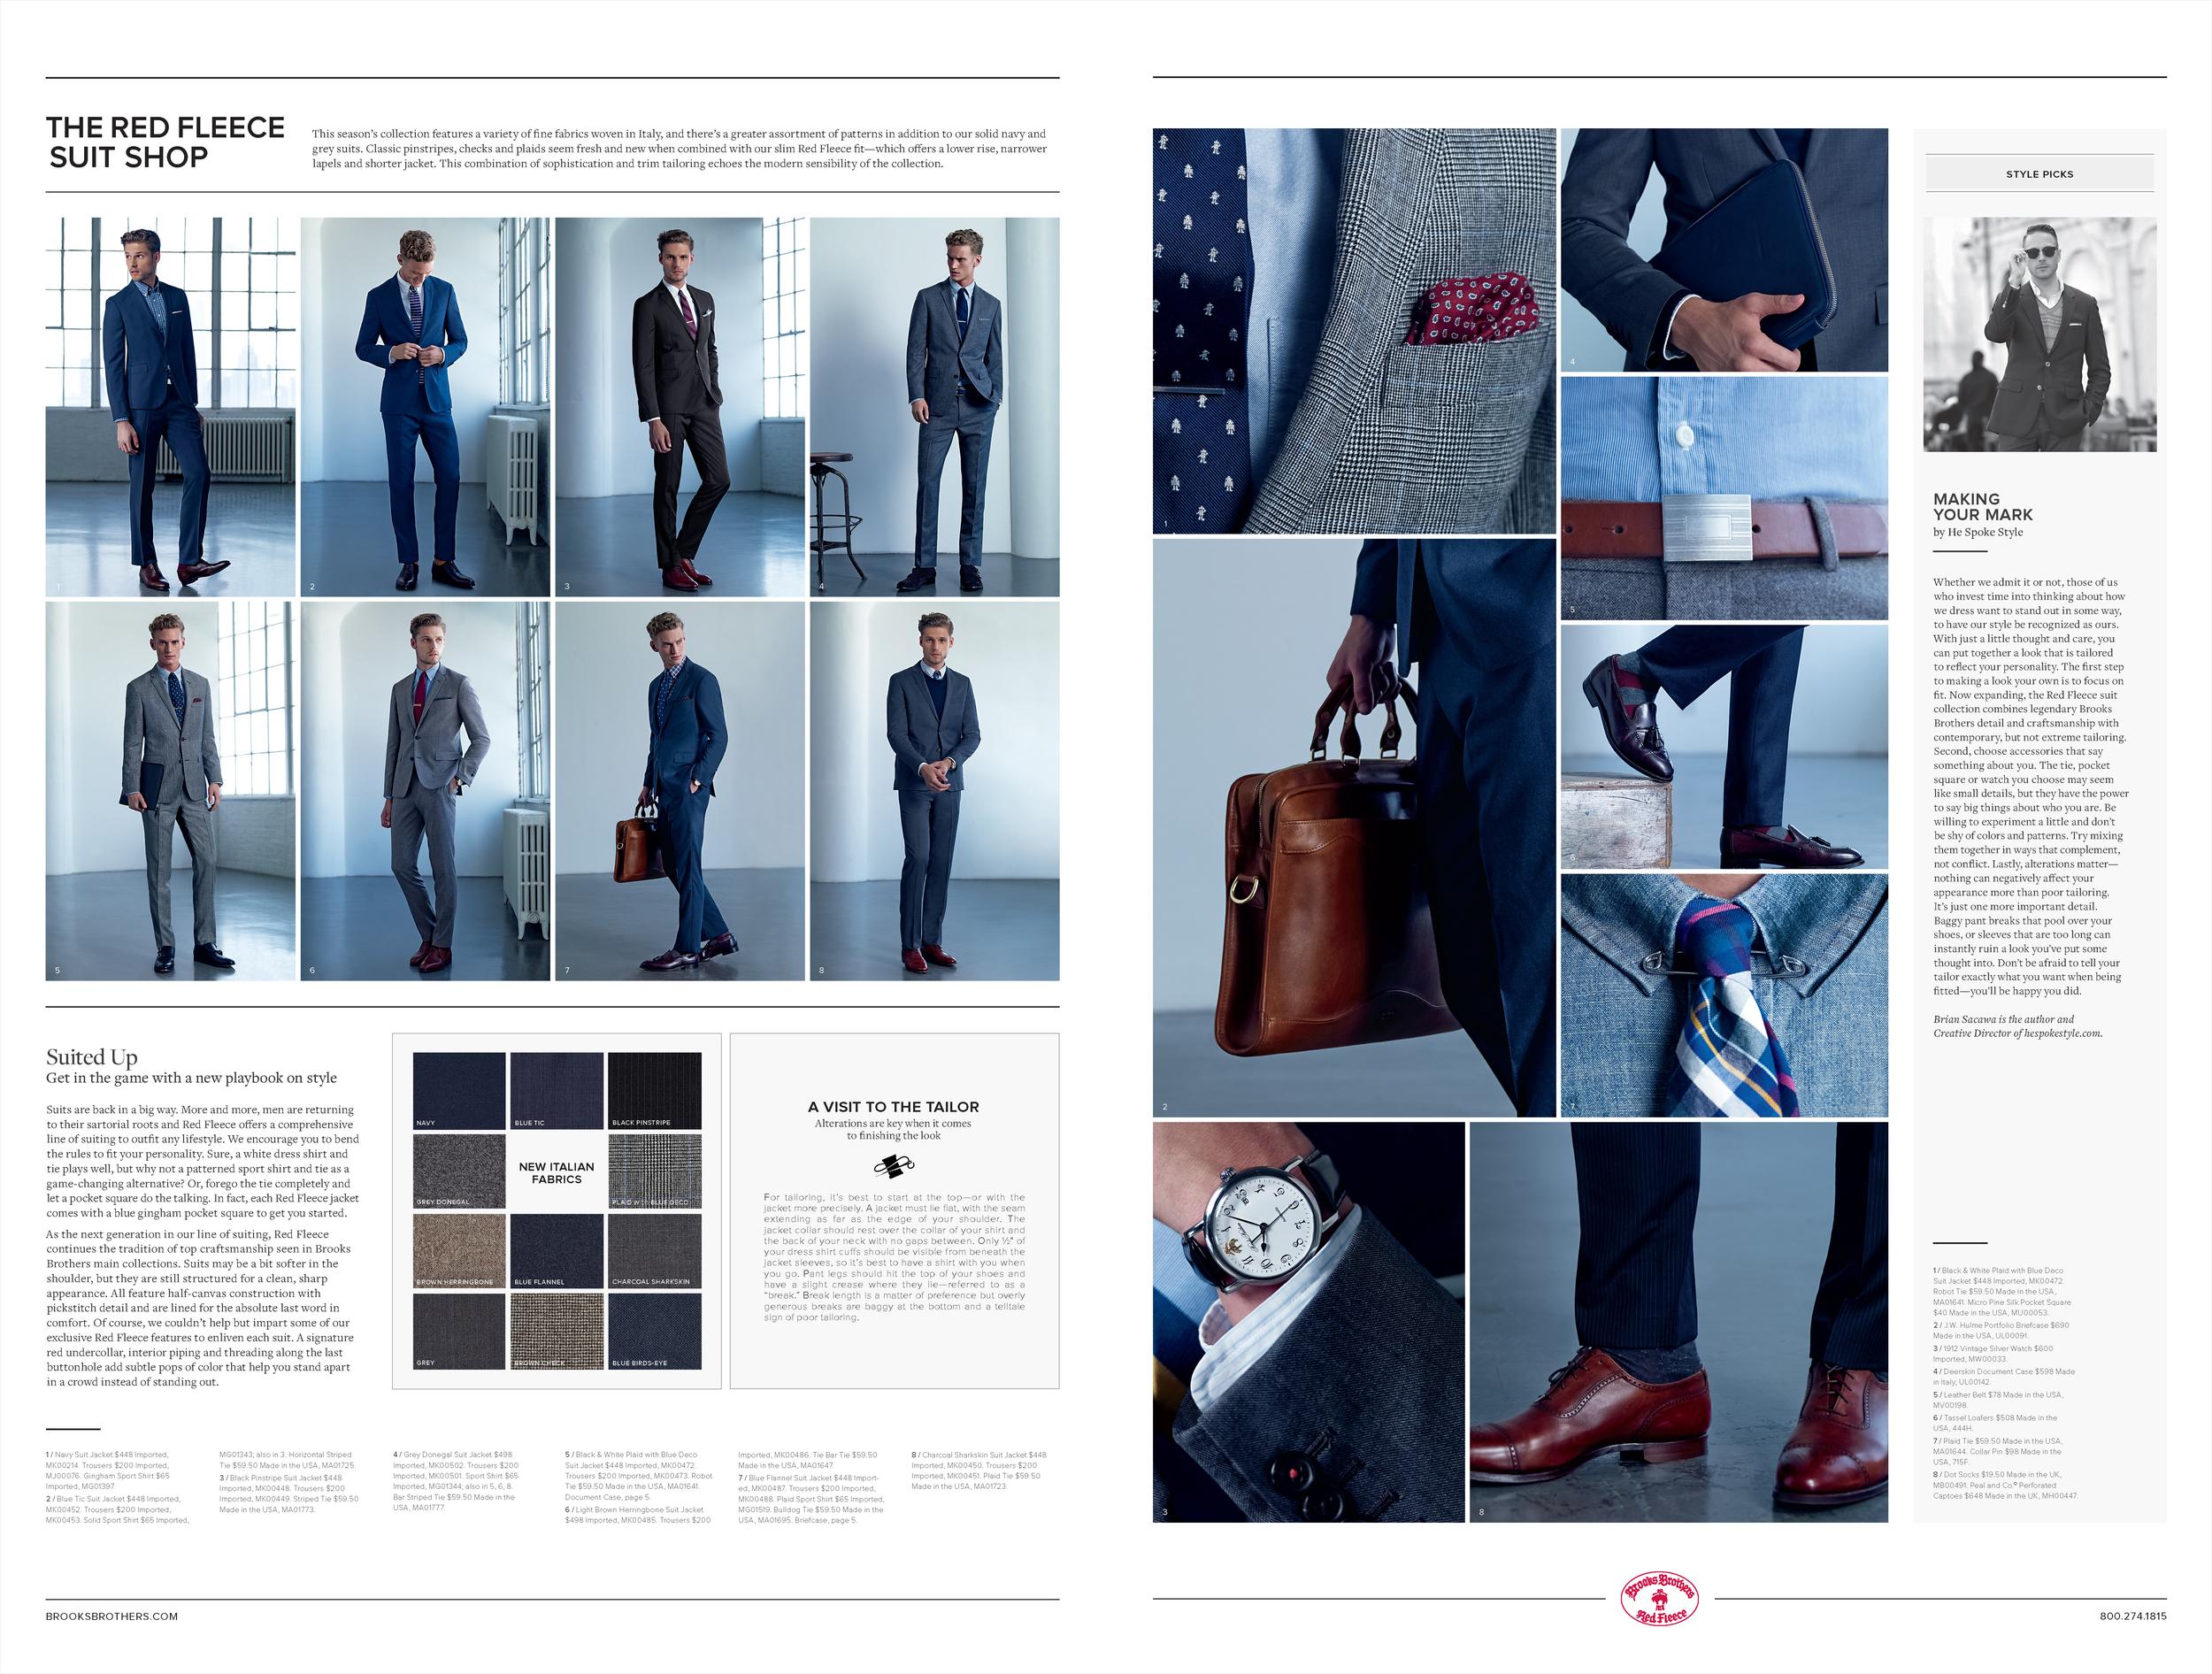 Red Fleece1_Page_04 copy.jpg